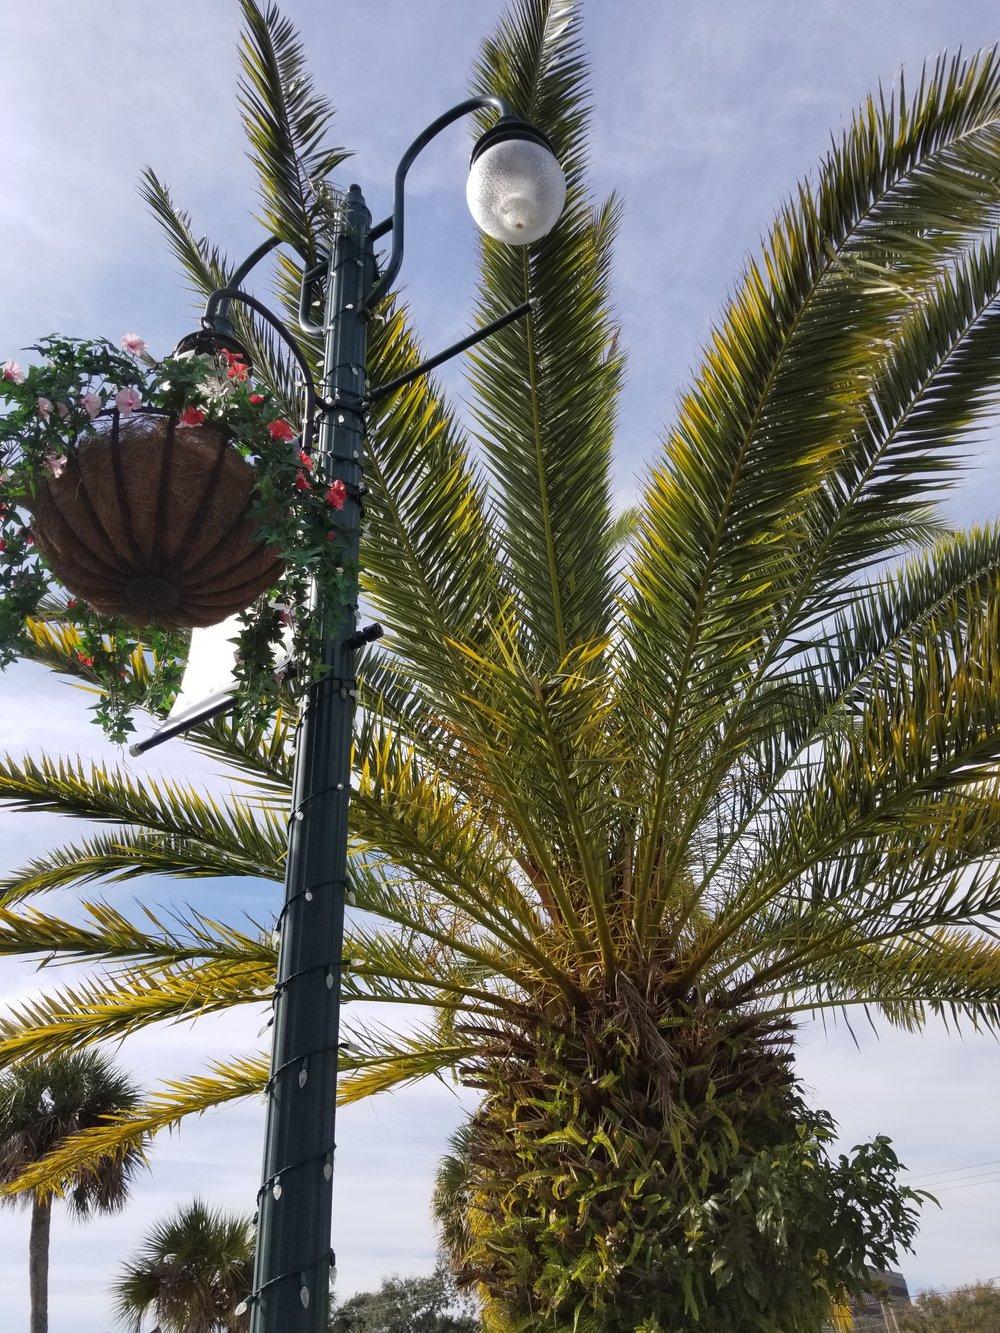 A lush palm along the sidewalk.